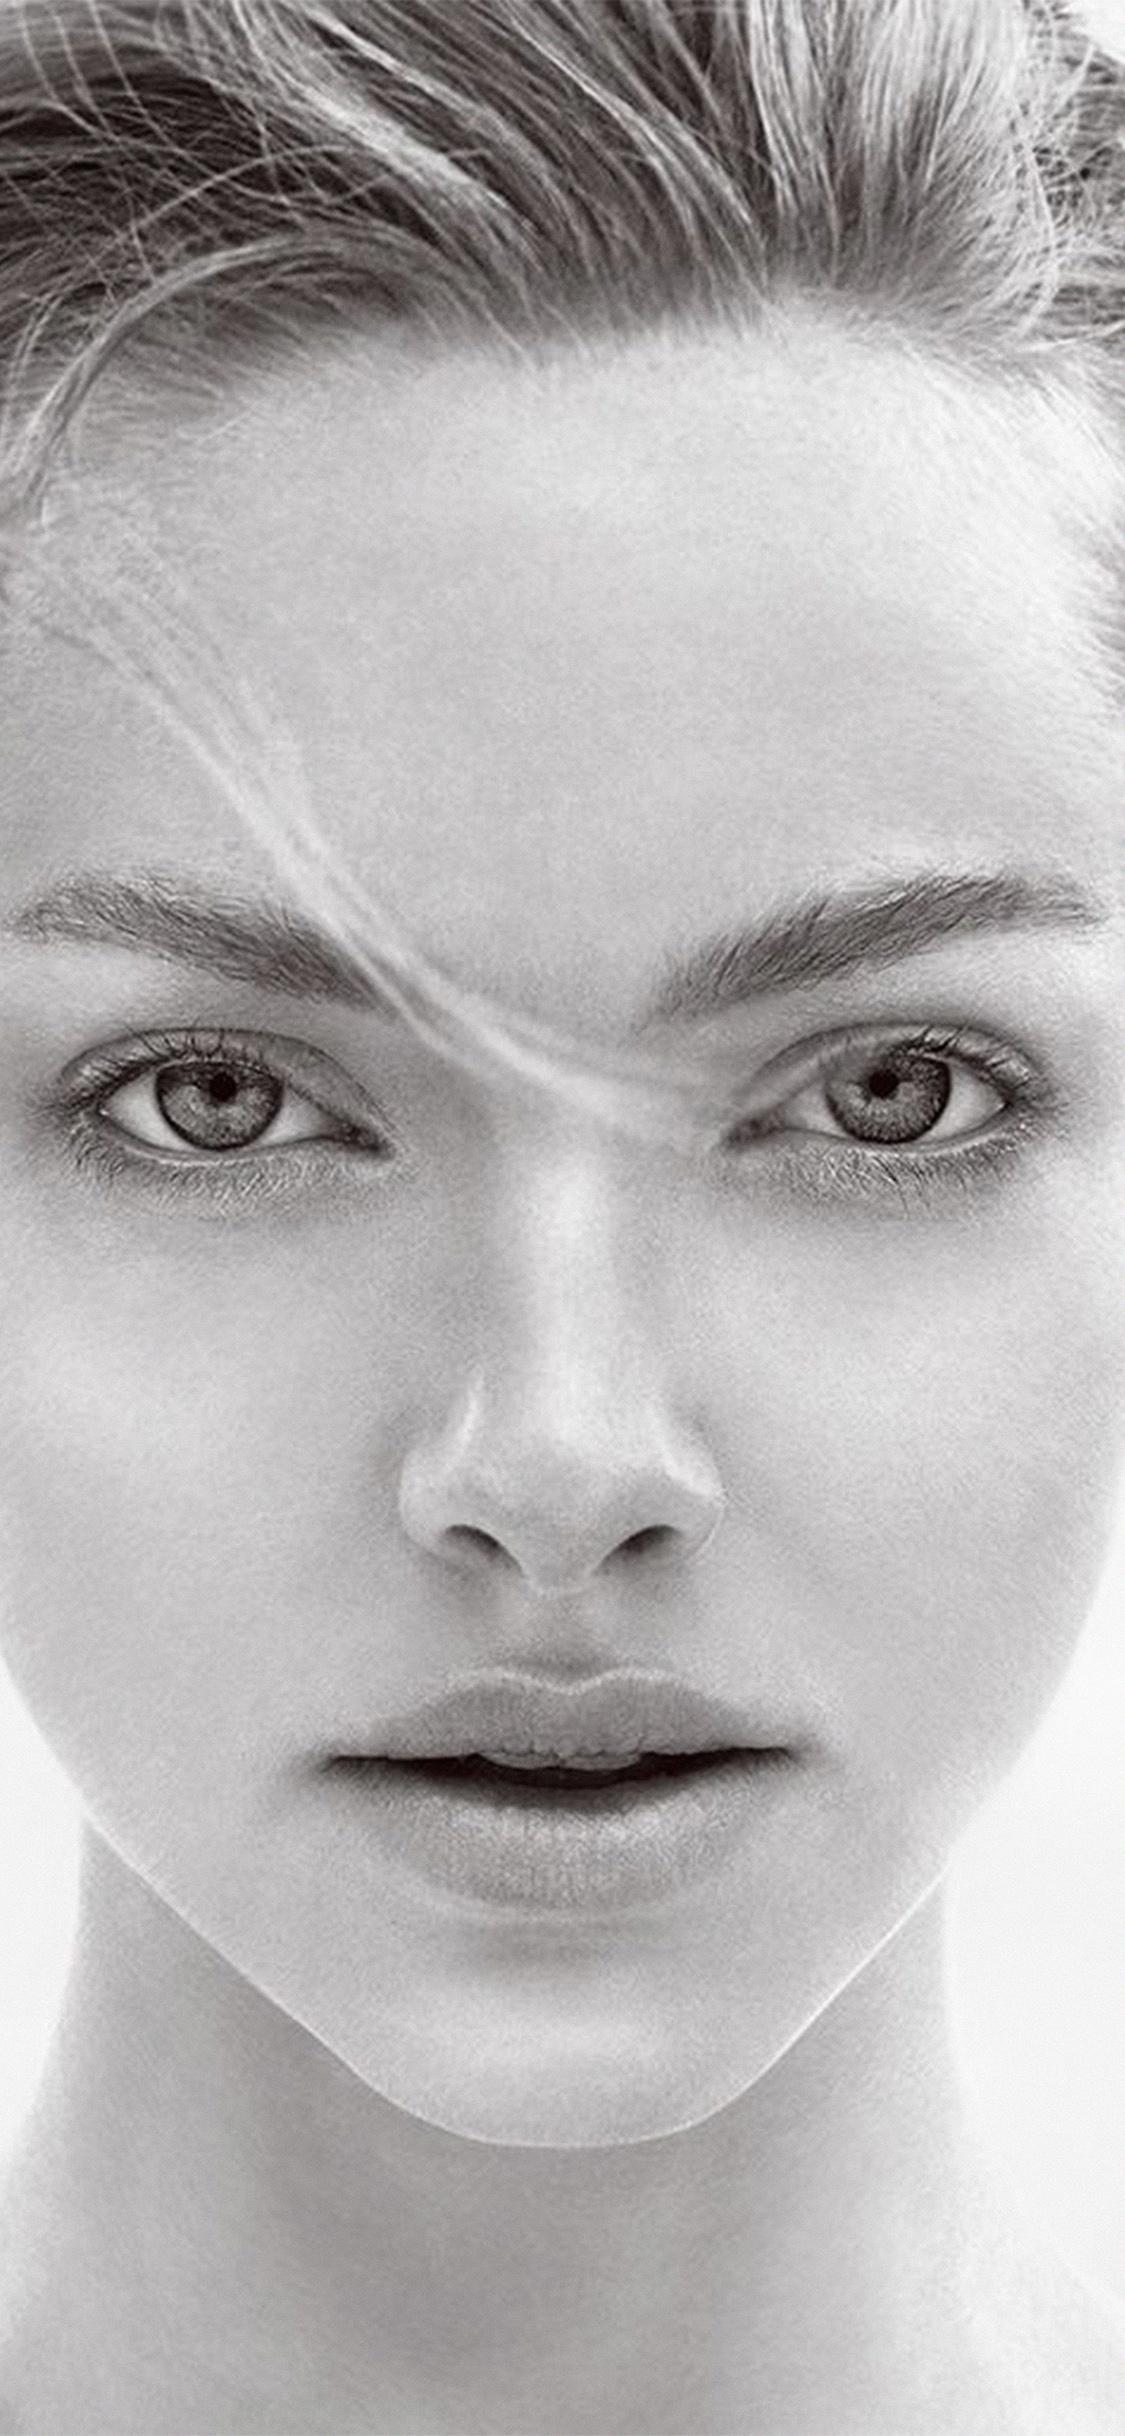 iPhoneXpapers.com-Apple-iPhone-wallpaper-hm30-amanda-seyfried-face-bw-celebrity